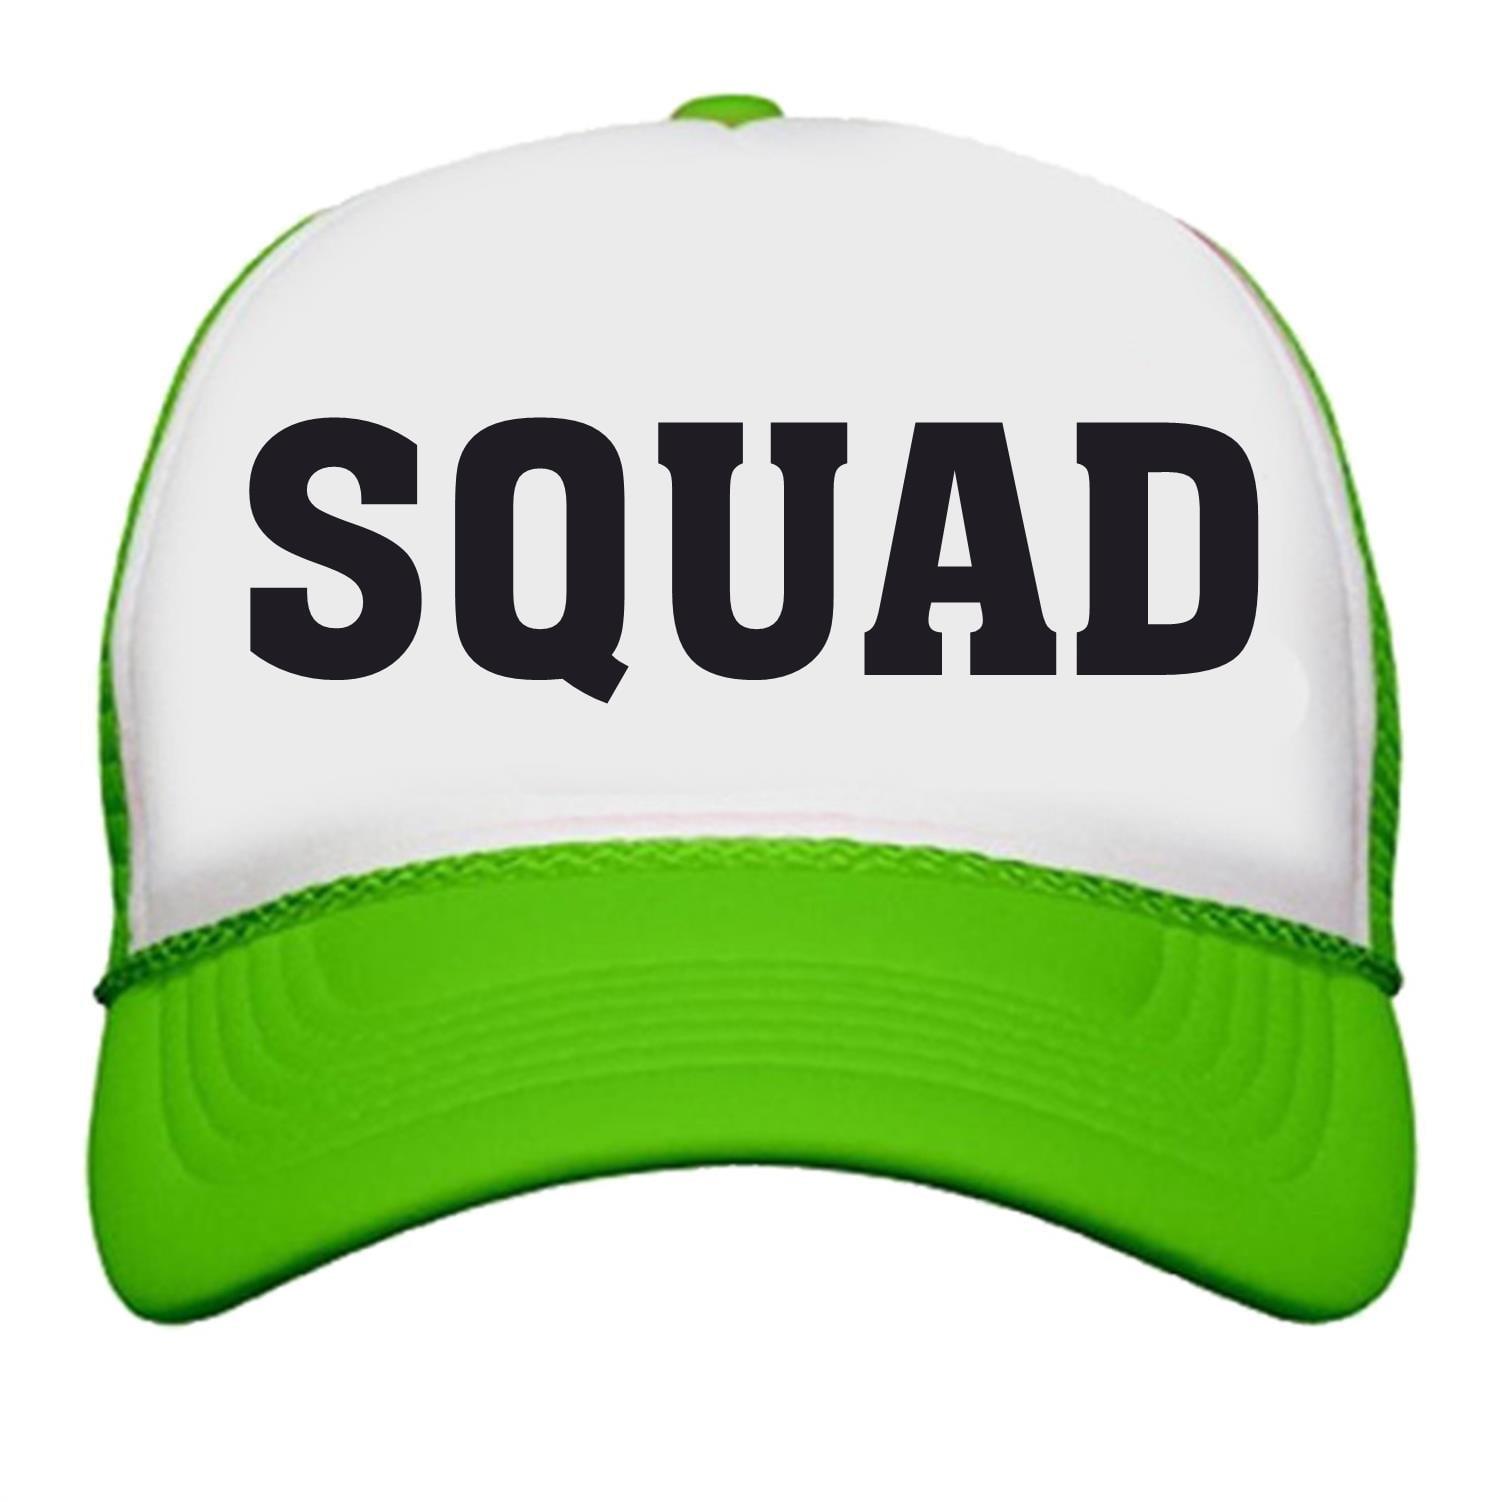 Bride Squad Neon Trucker Snapback Hats Bachelorette Party Wedding Bridel  Party - Walmart.com ee117a2ea9b8